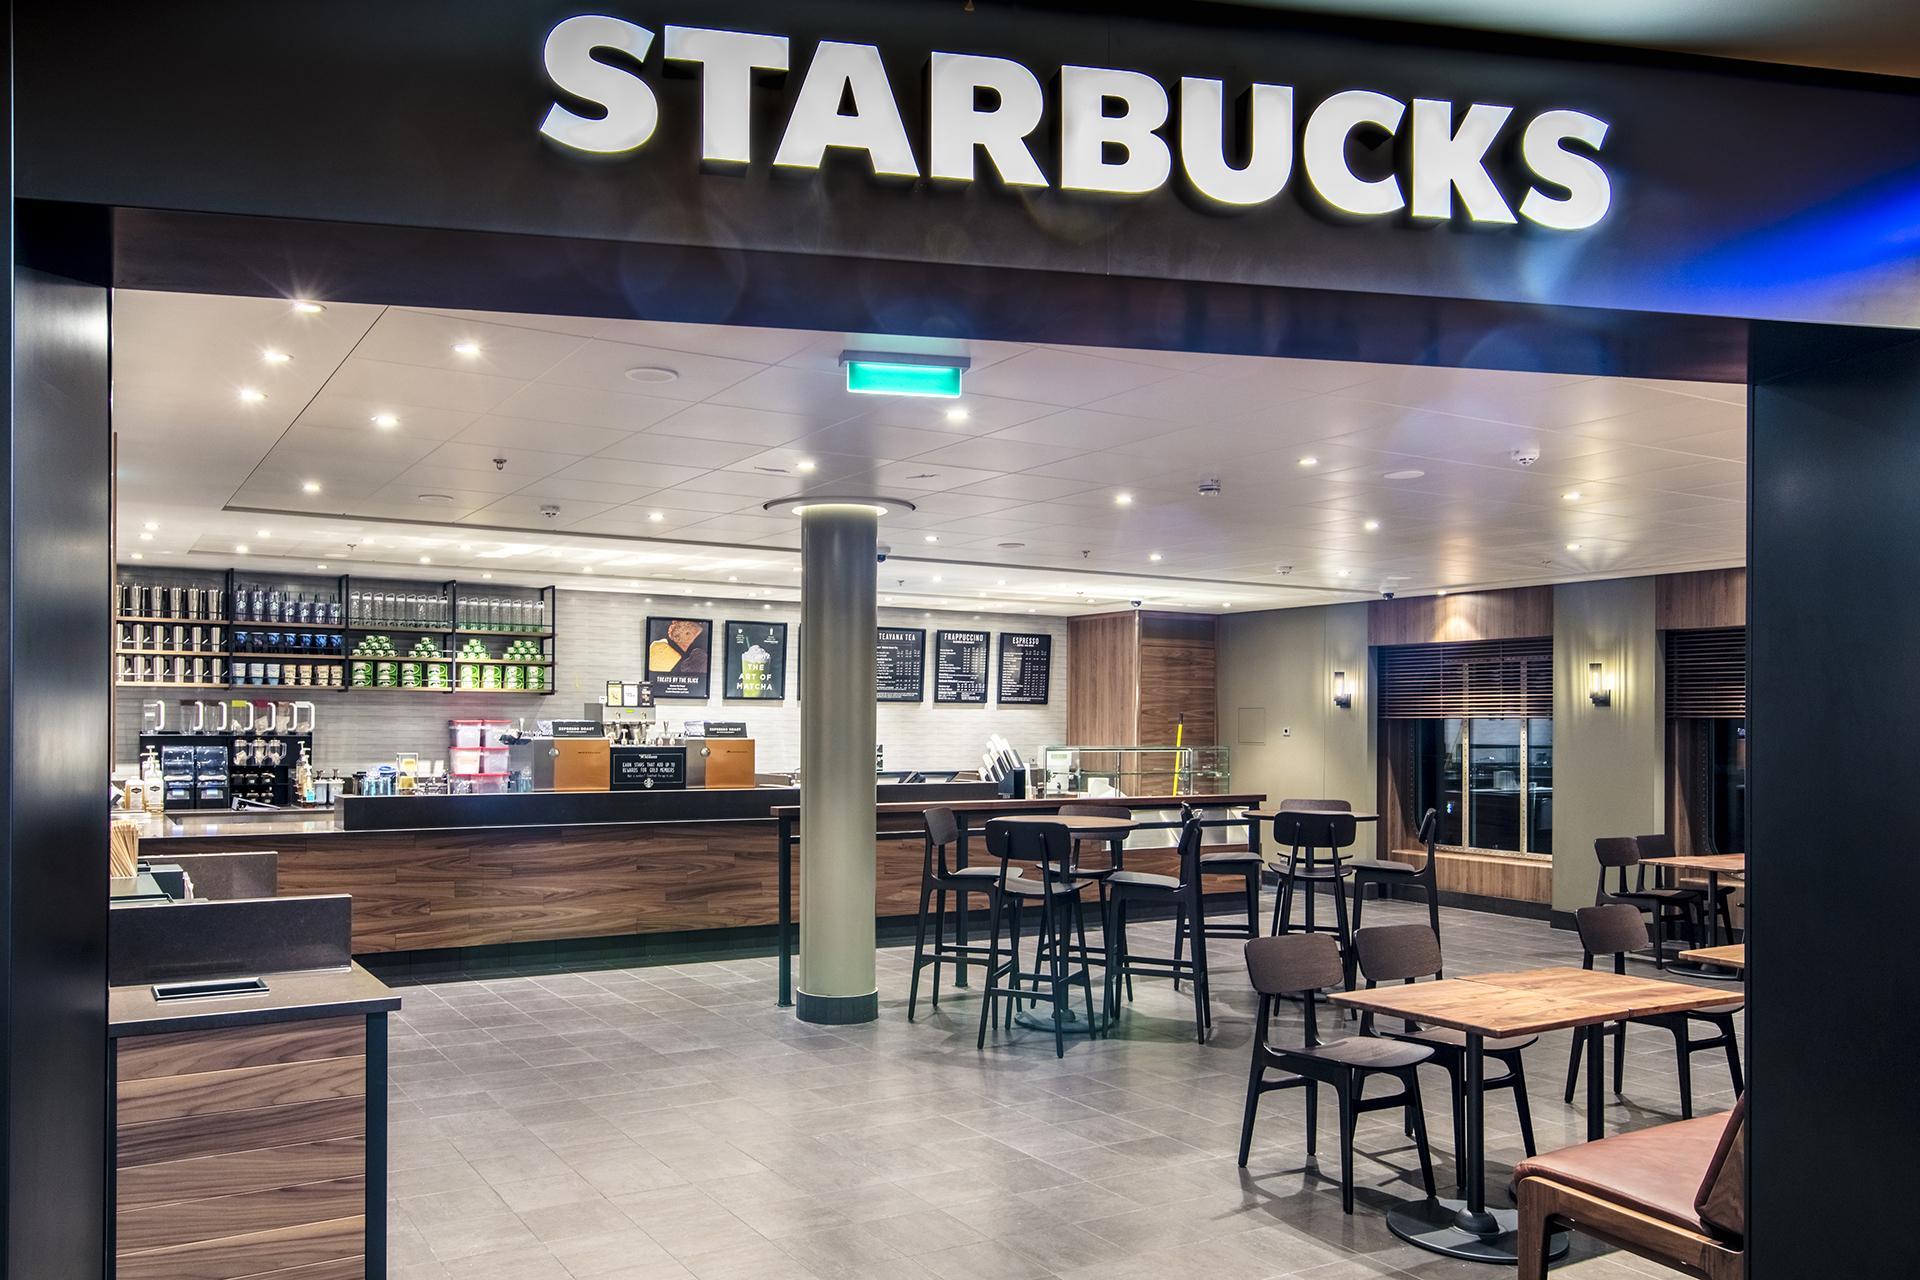 steinwerk_friedeburg_Starbucks_01